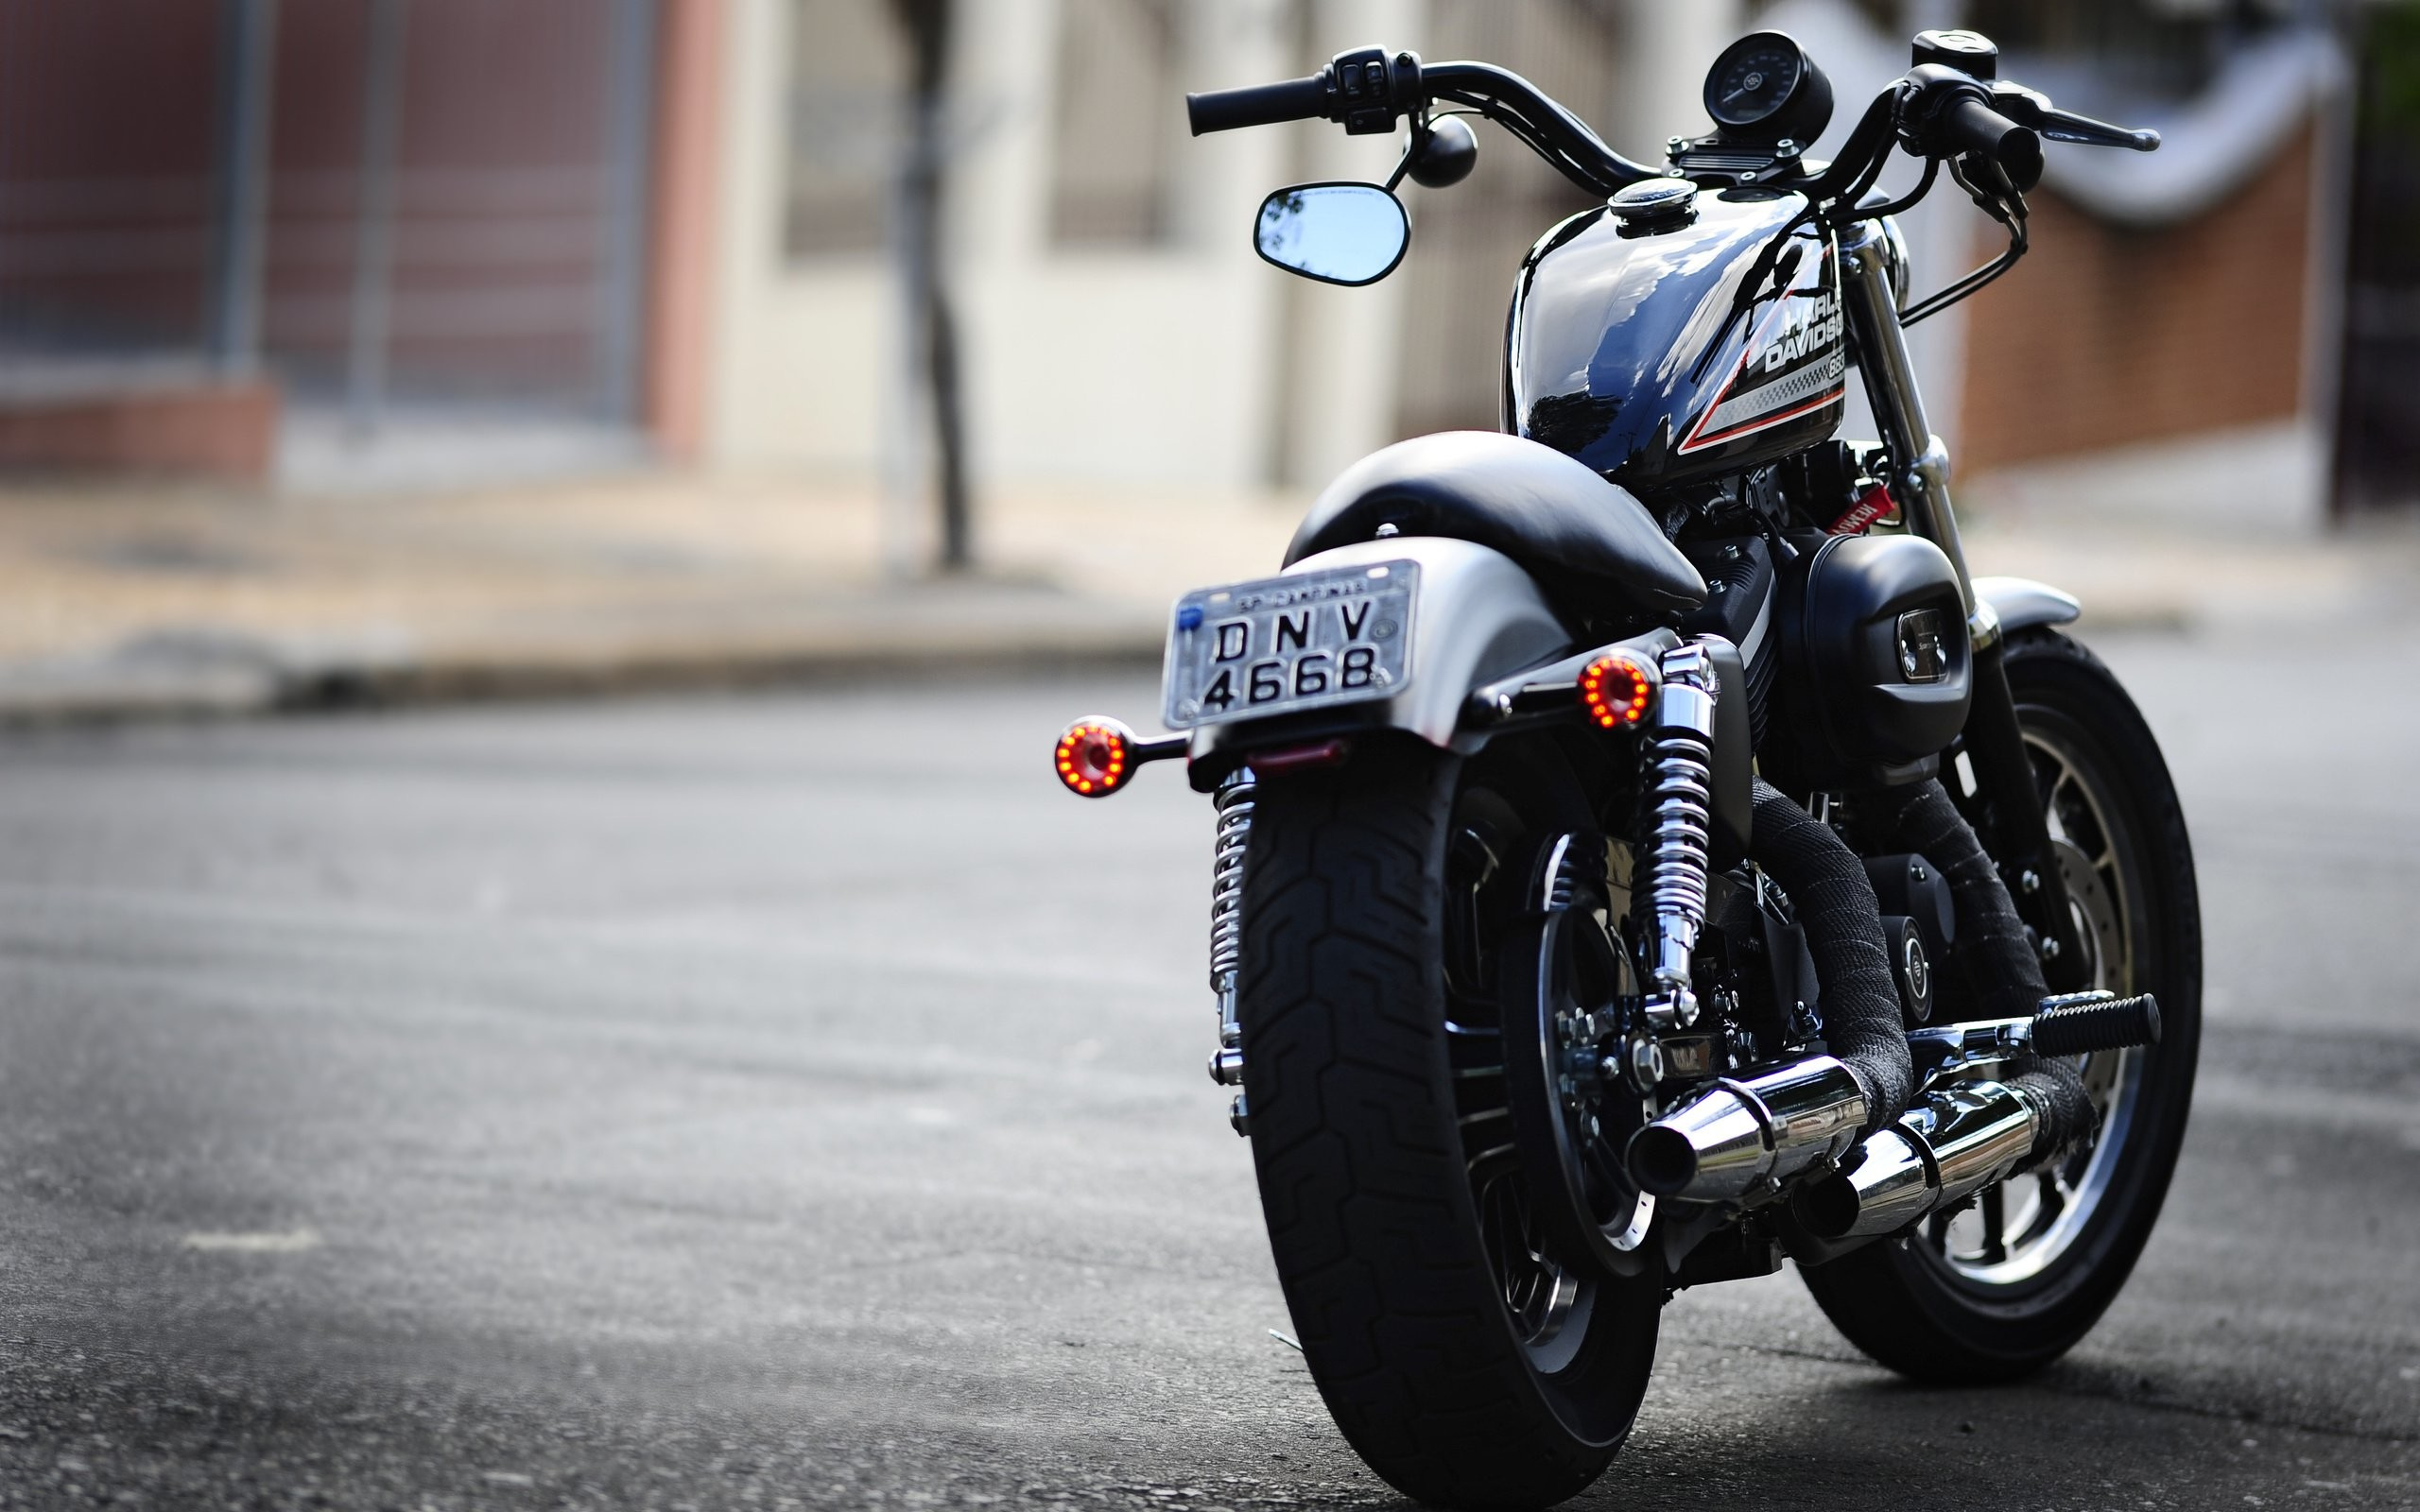 Harley Davidson Wallpapers Screensavers 80 Images 1920x1200 Wallpaper Vrscdx Bikes